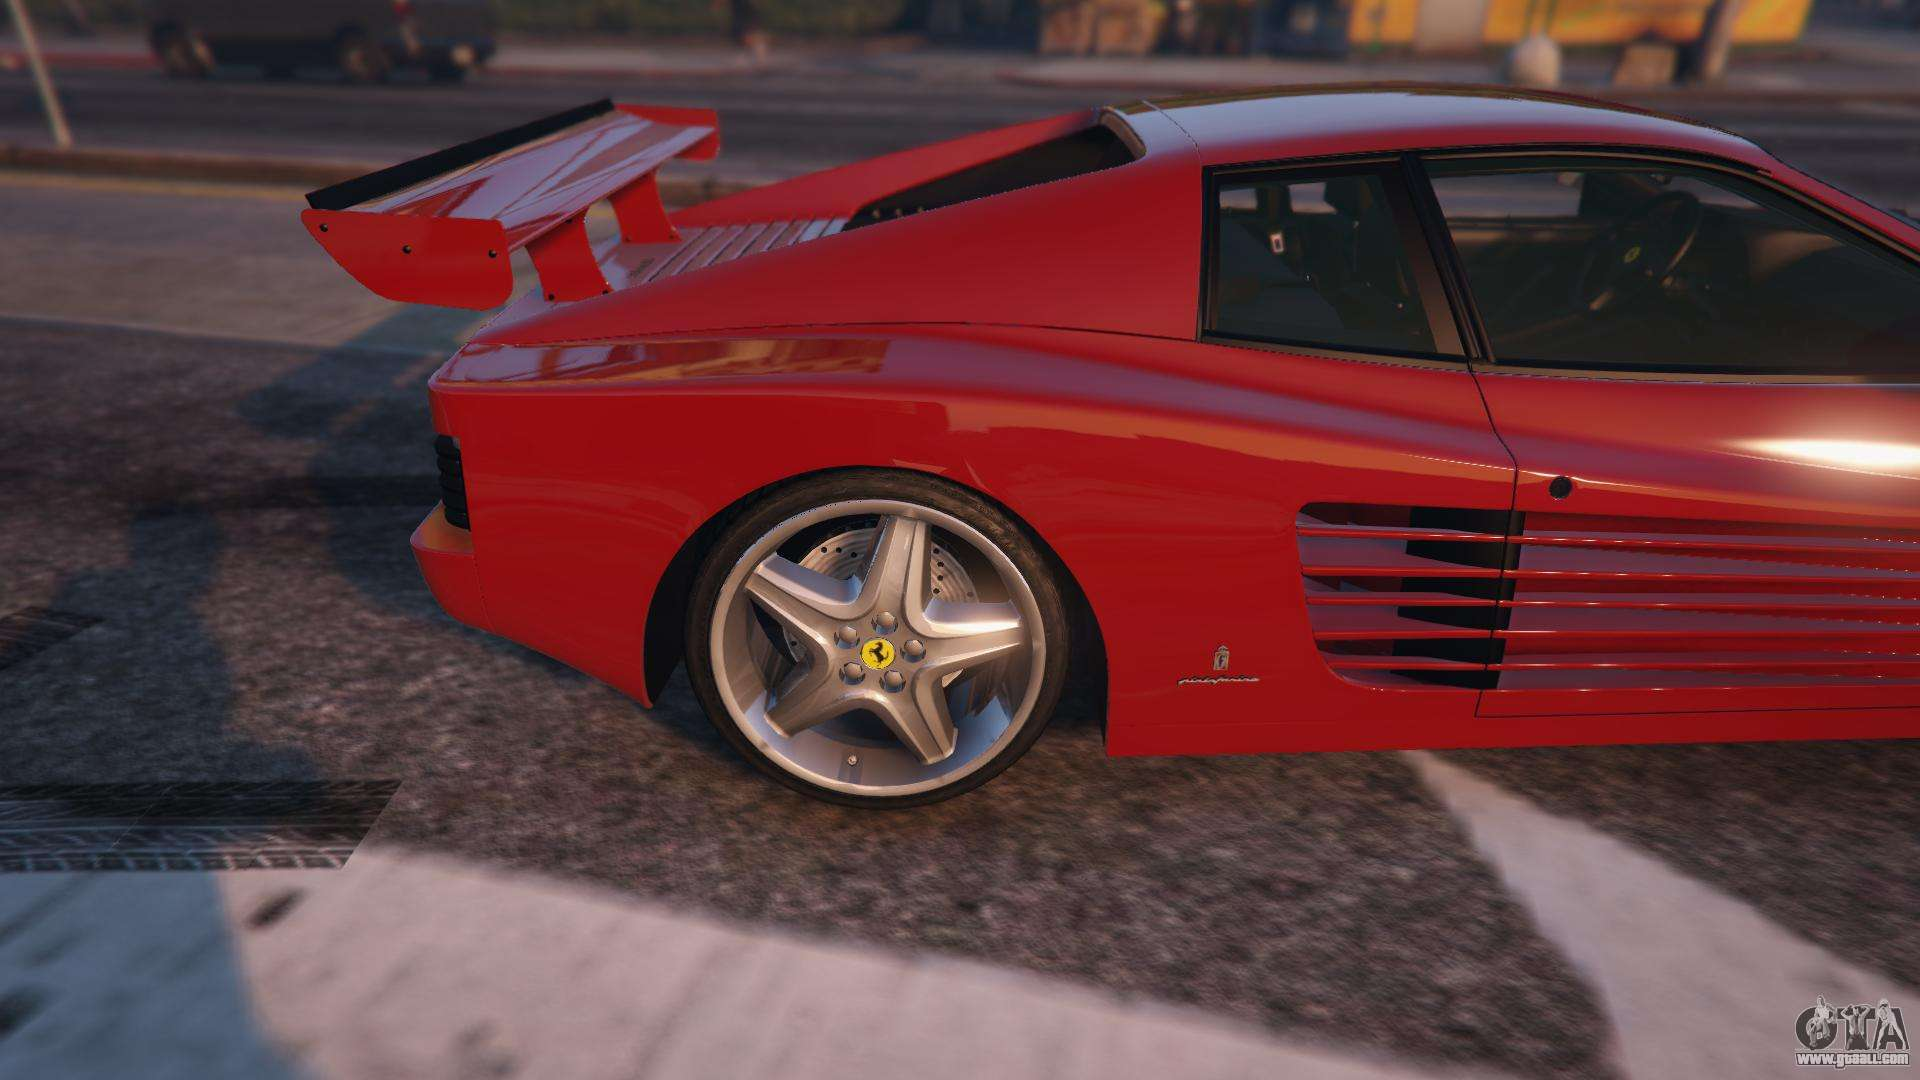 Ferrari testarossa 512 tr 1991 gta 5 for gta 5 gta 5 ferrari testarossa 512 tr 1991 gta 5 rear left side view vanachro Images